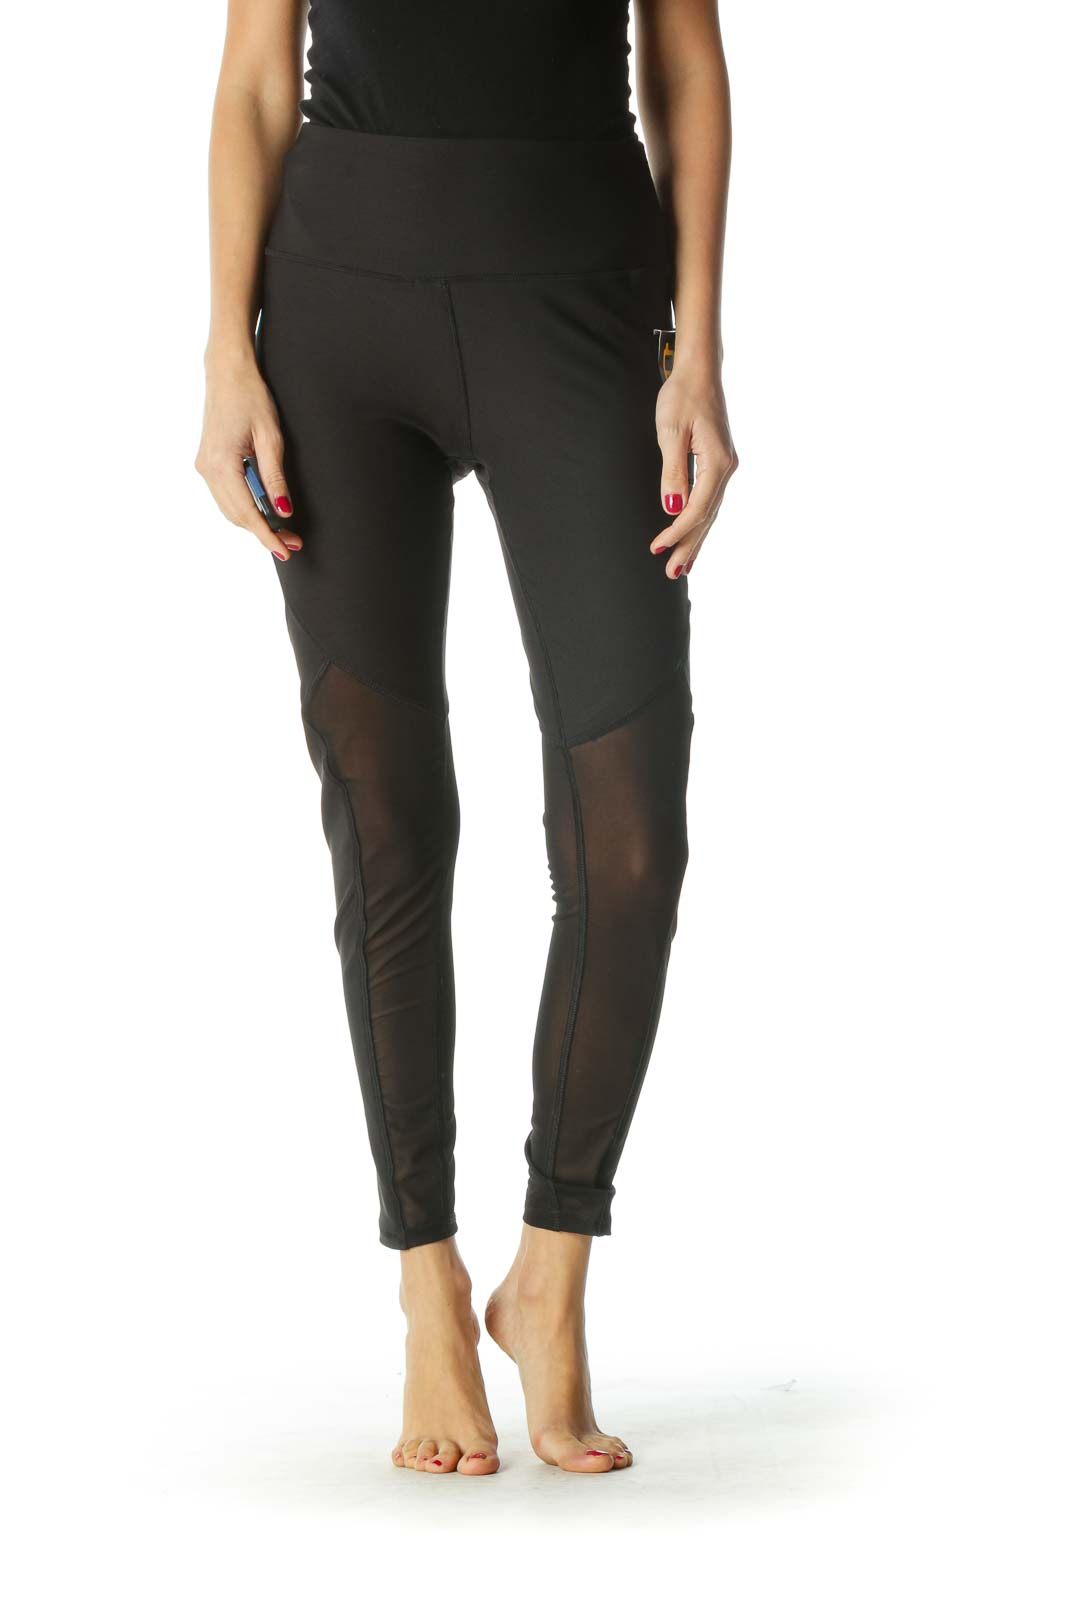 Black Sheer Detail Active Leggings Front